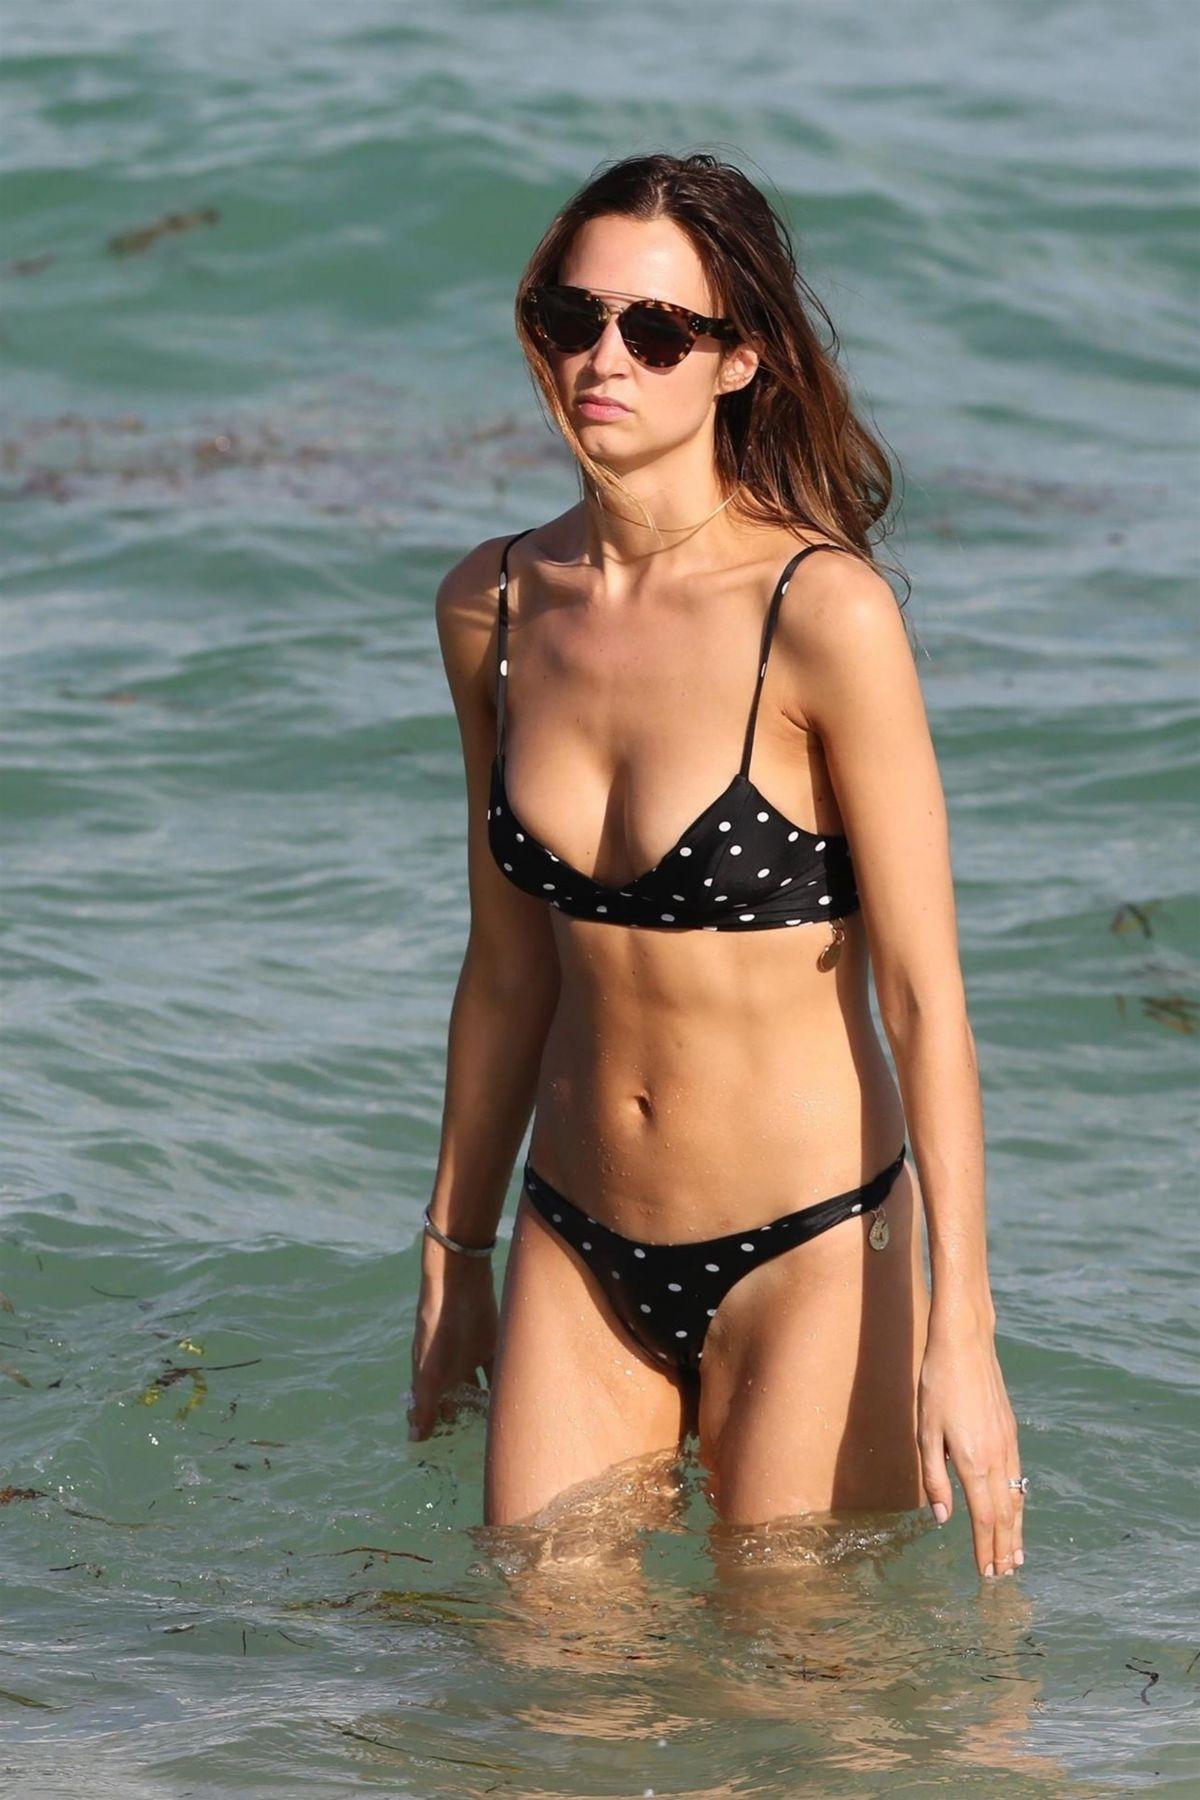 Alice Amelie in Bikini on the beach in Miami Pic 5 of 35